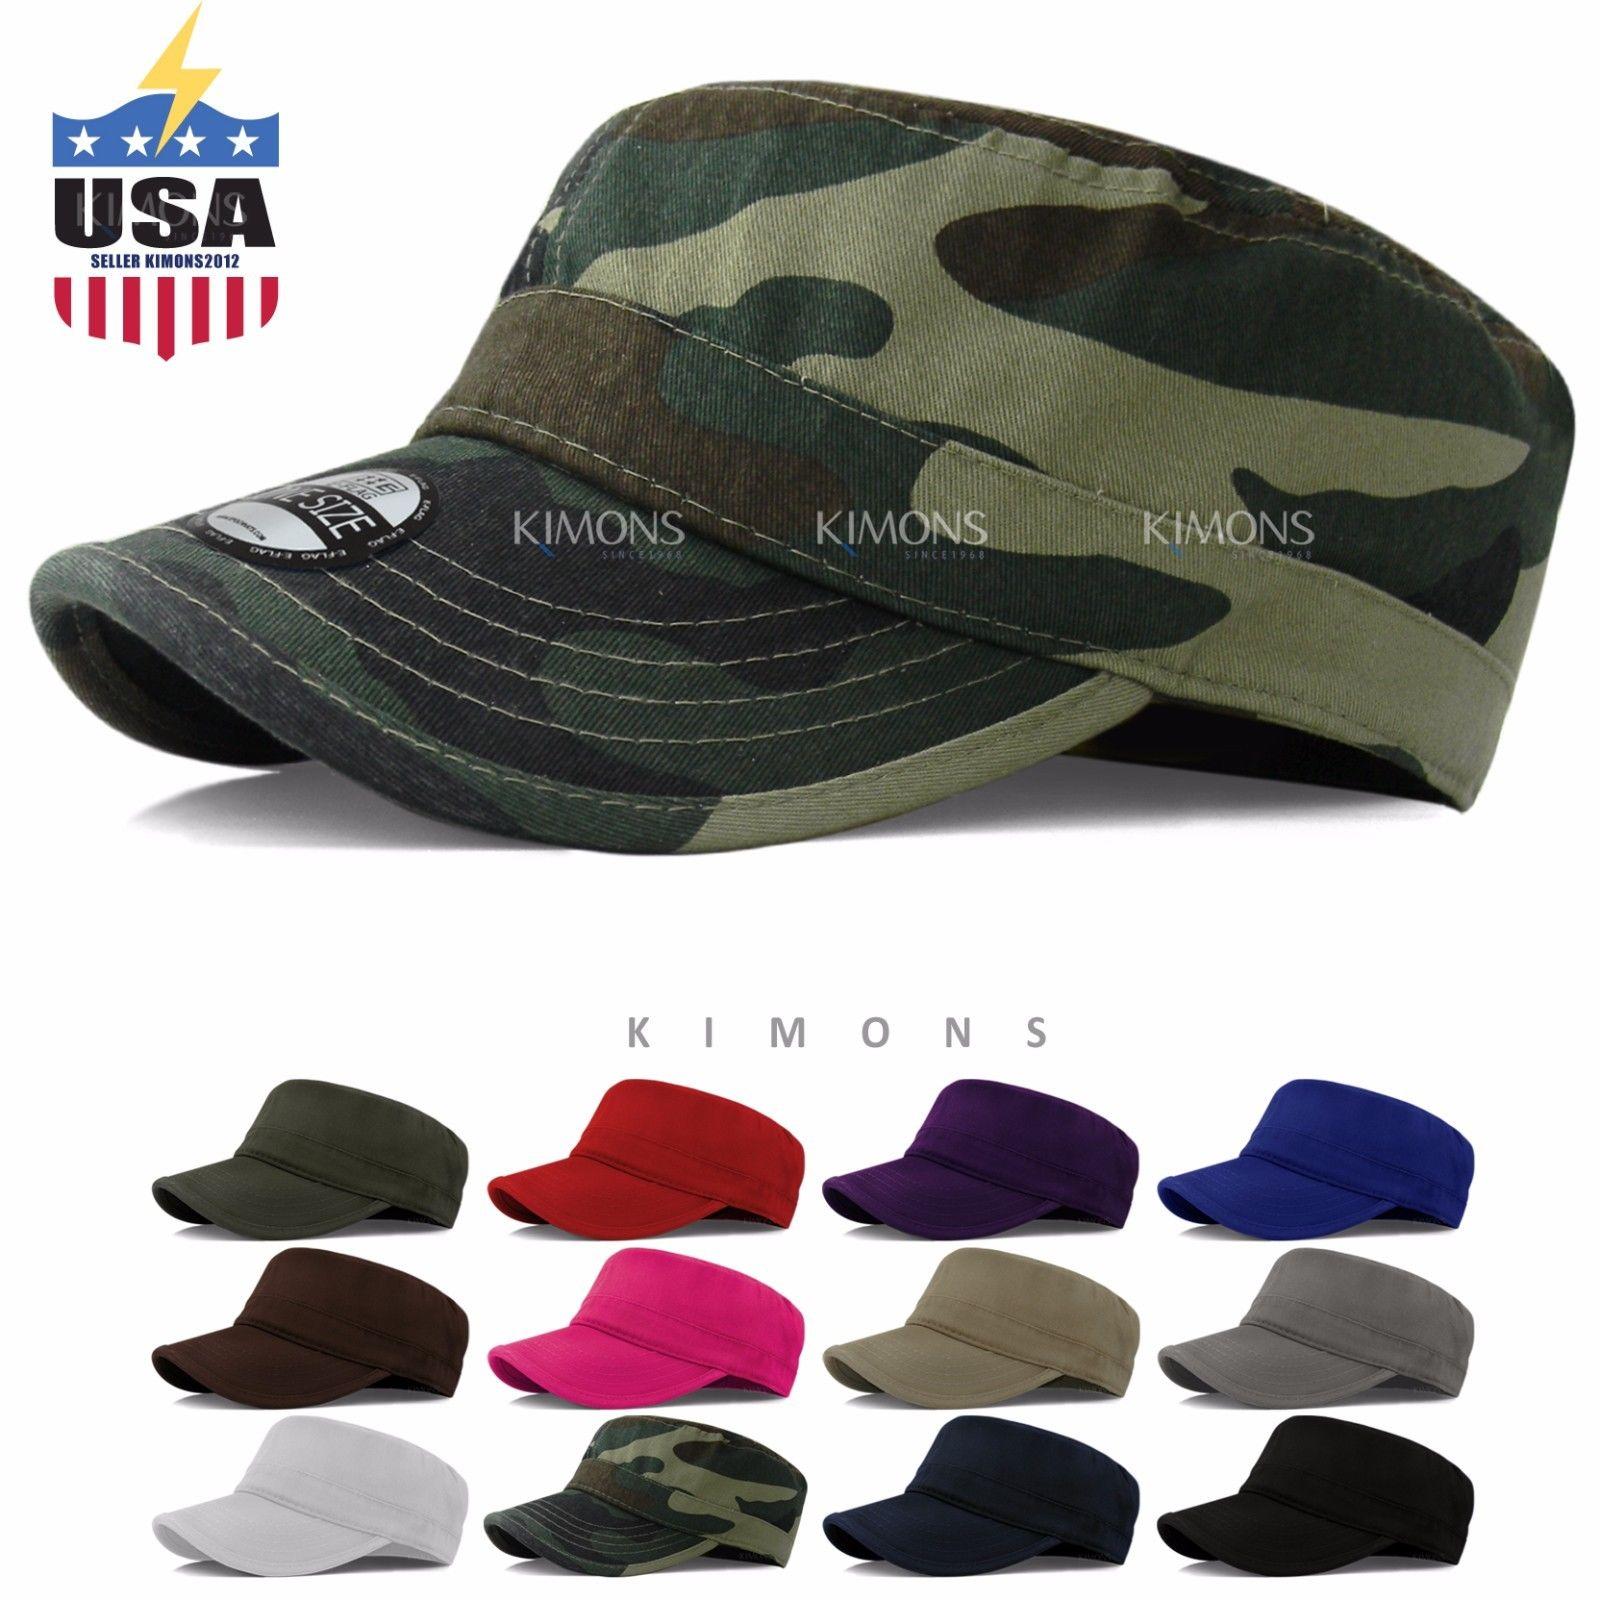 e3e93fcb972 Army Cadet Military Patrol Castro Cap Hat Men Women Golf Driving Summer  Baseball